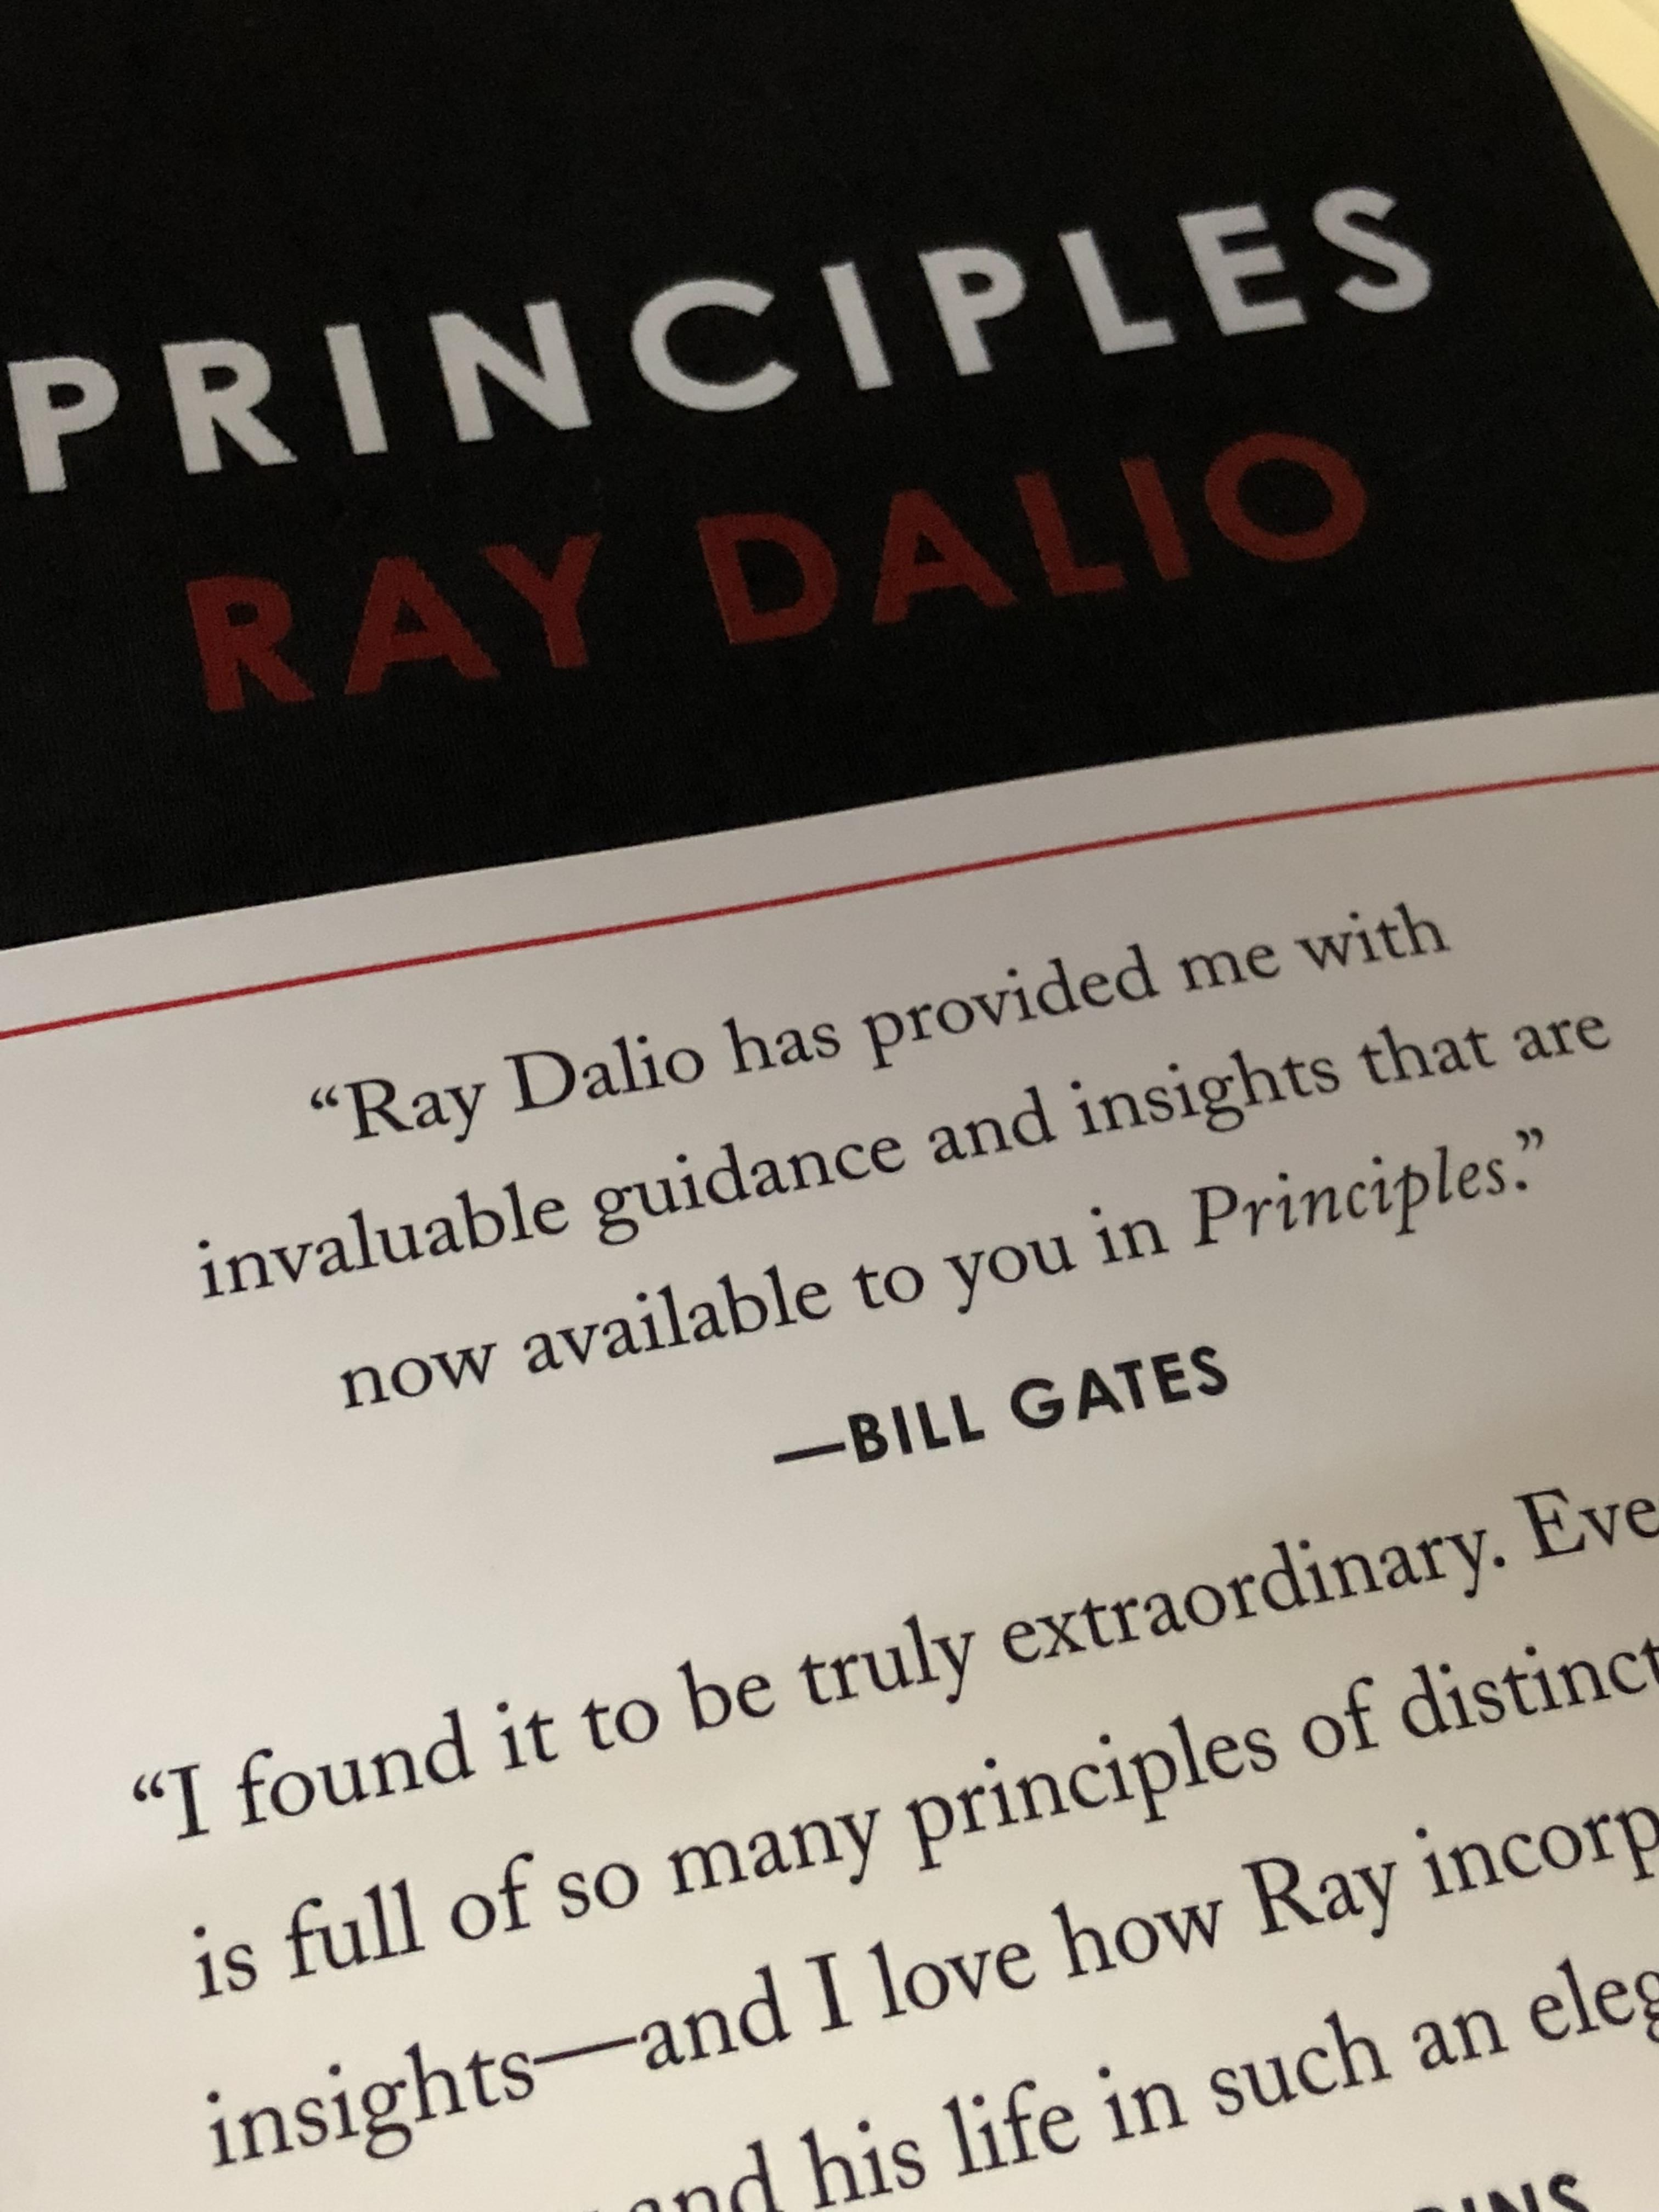 Next book to read:Principles.